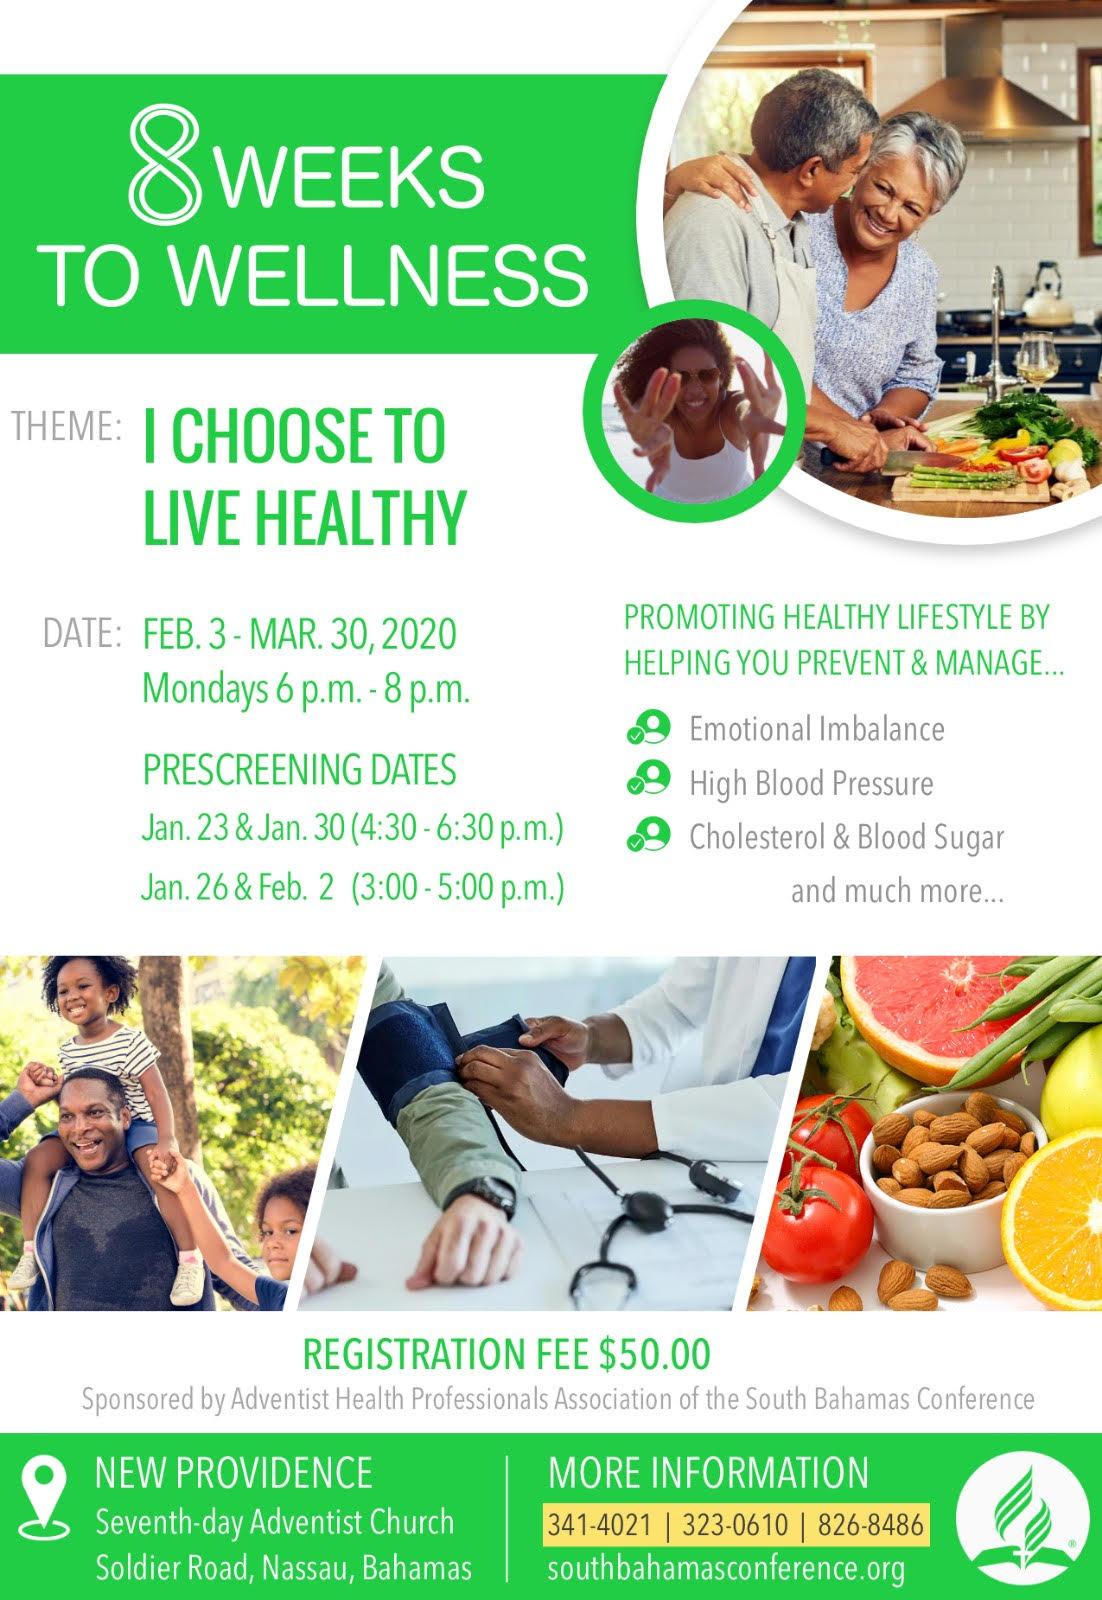 8 Weeks to Wellness 2020